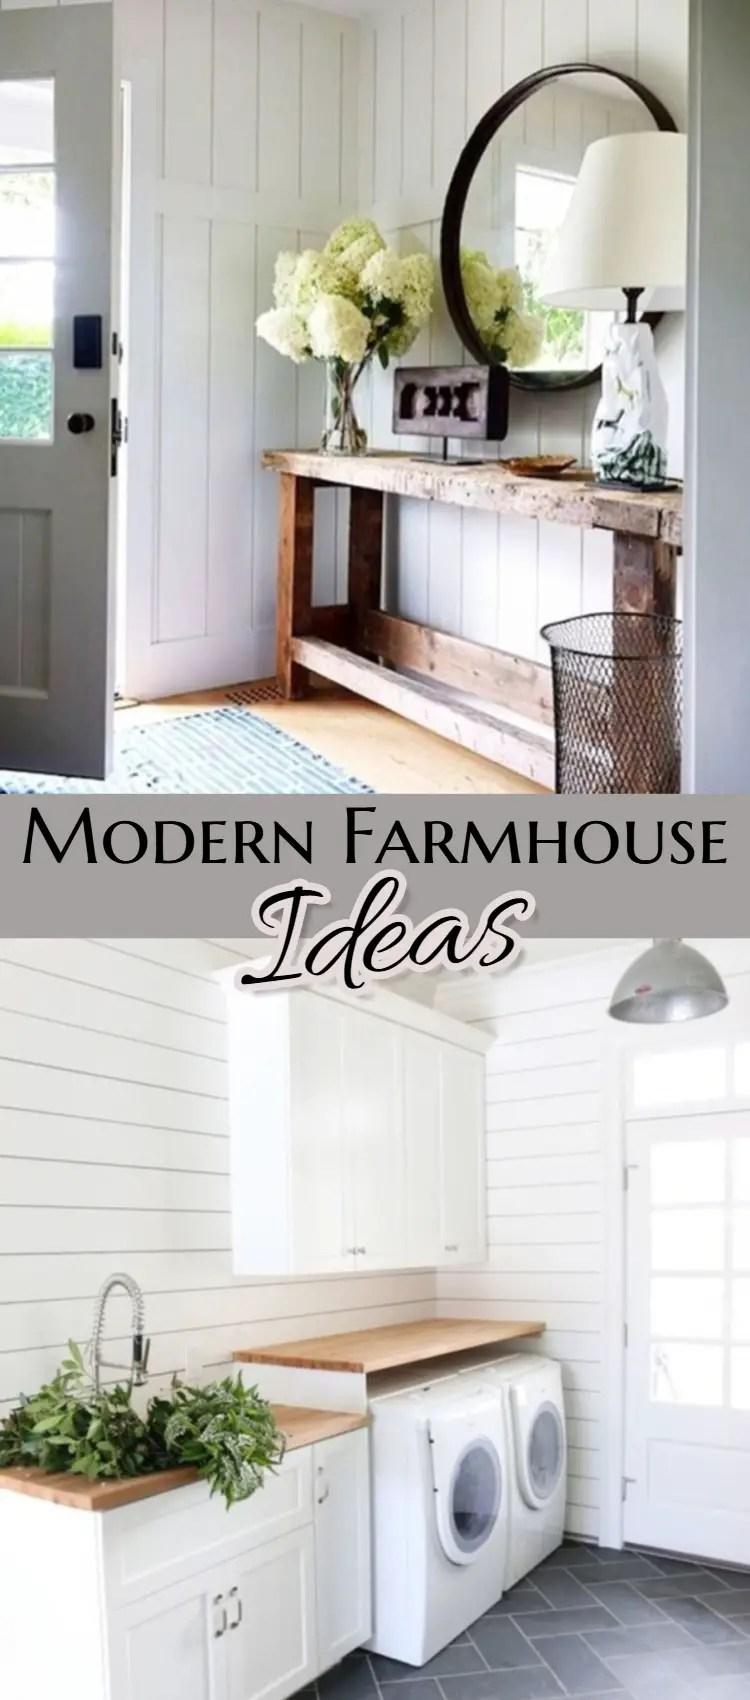 Modern Farmhouse Decorating Ideas for Every Room in Your Home - GORGEOUS farmhouse decor ideas!